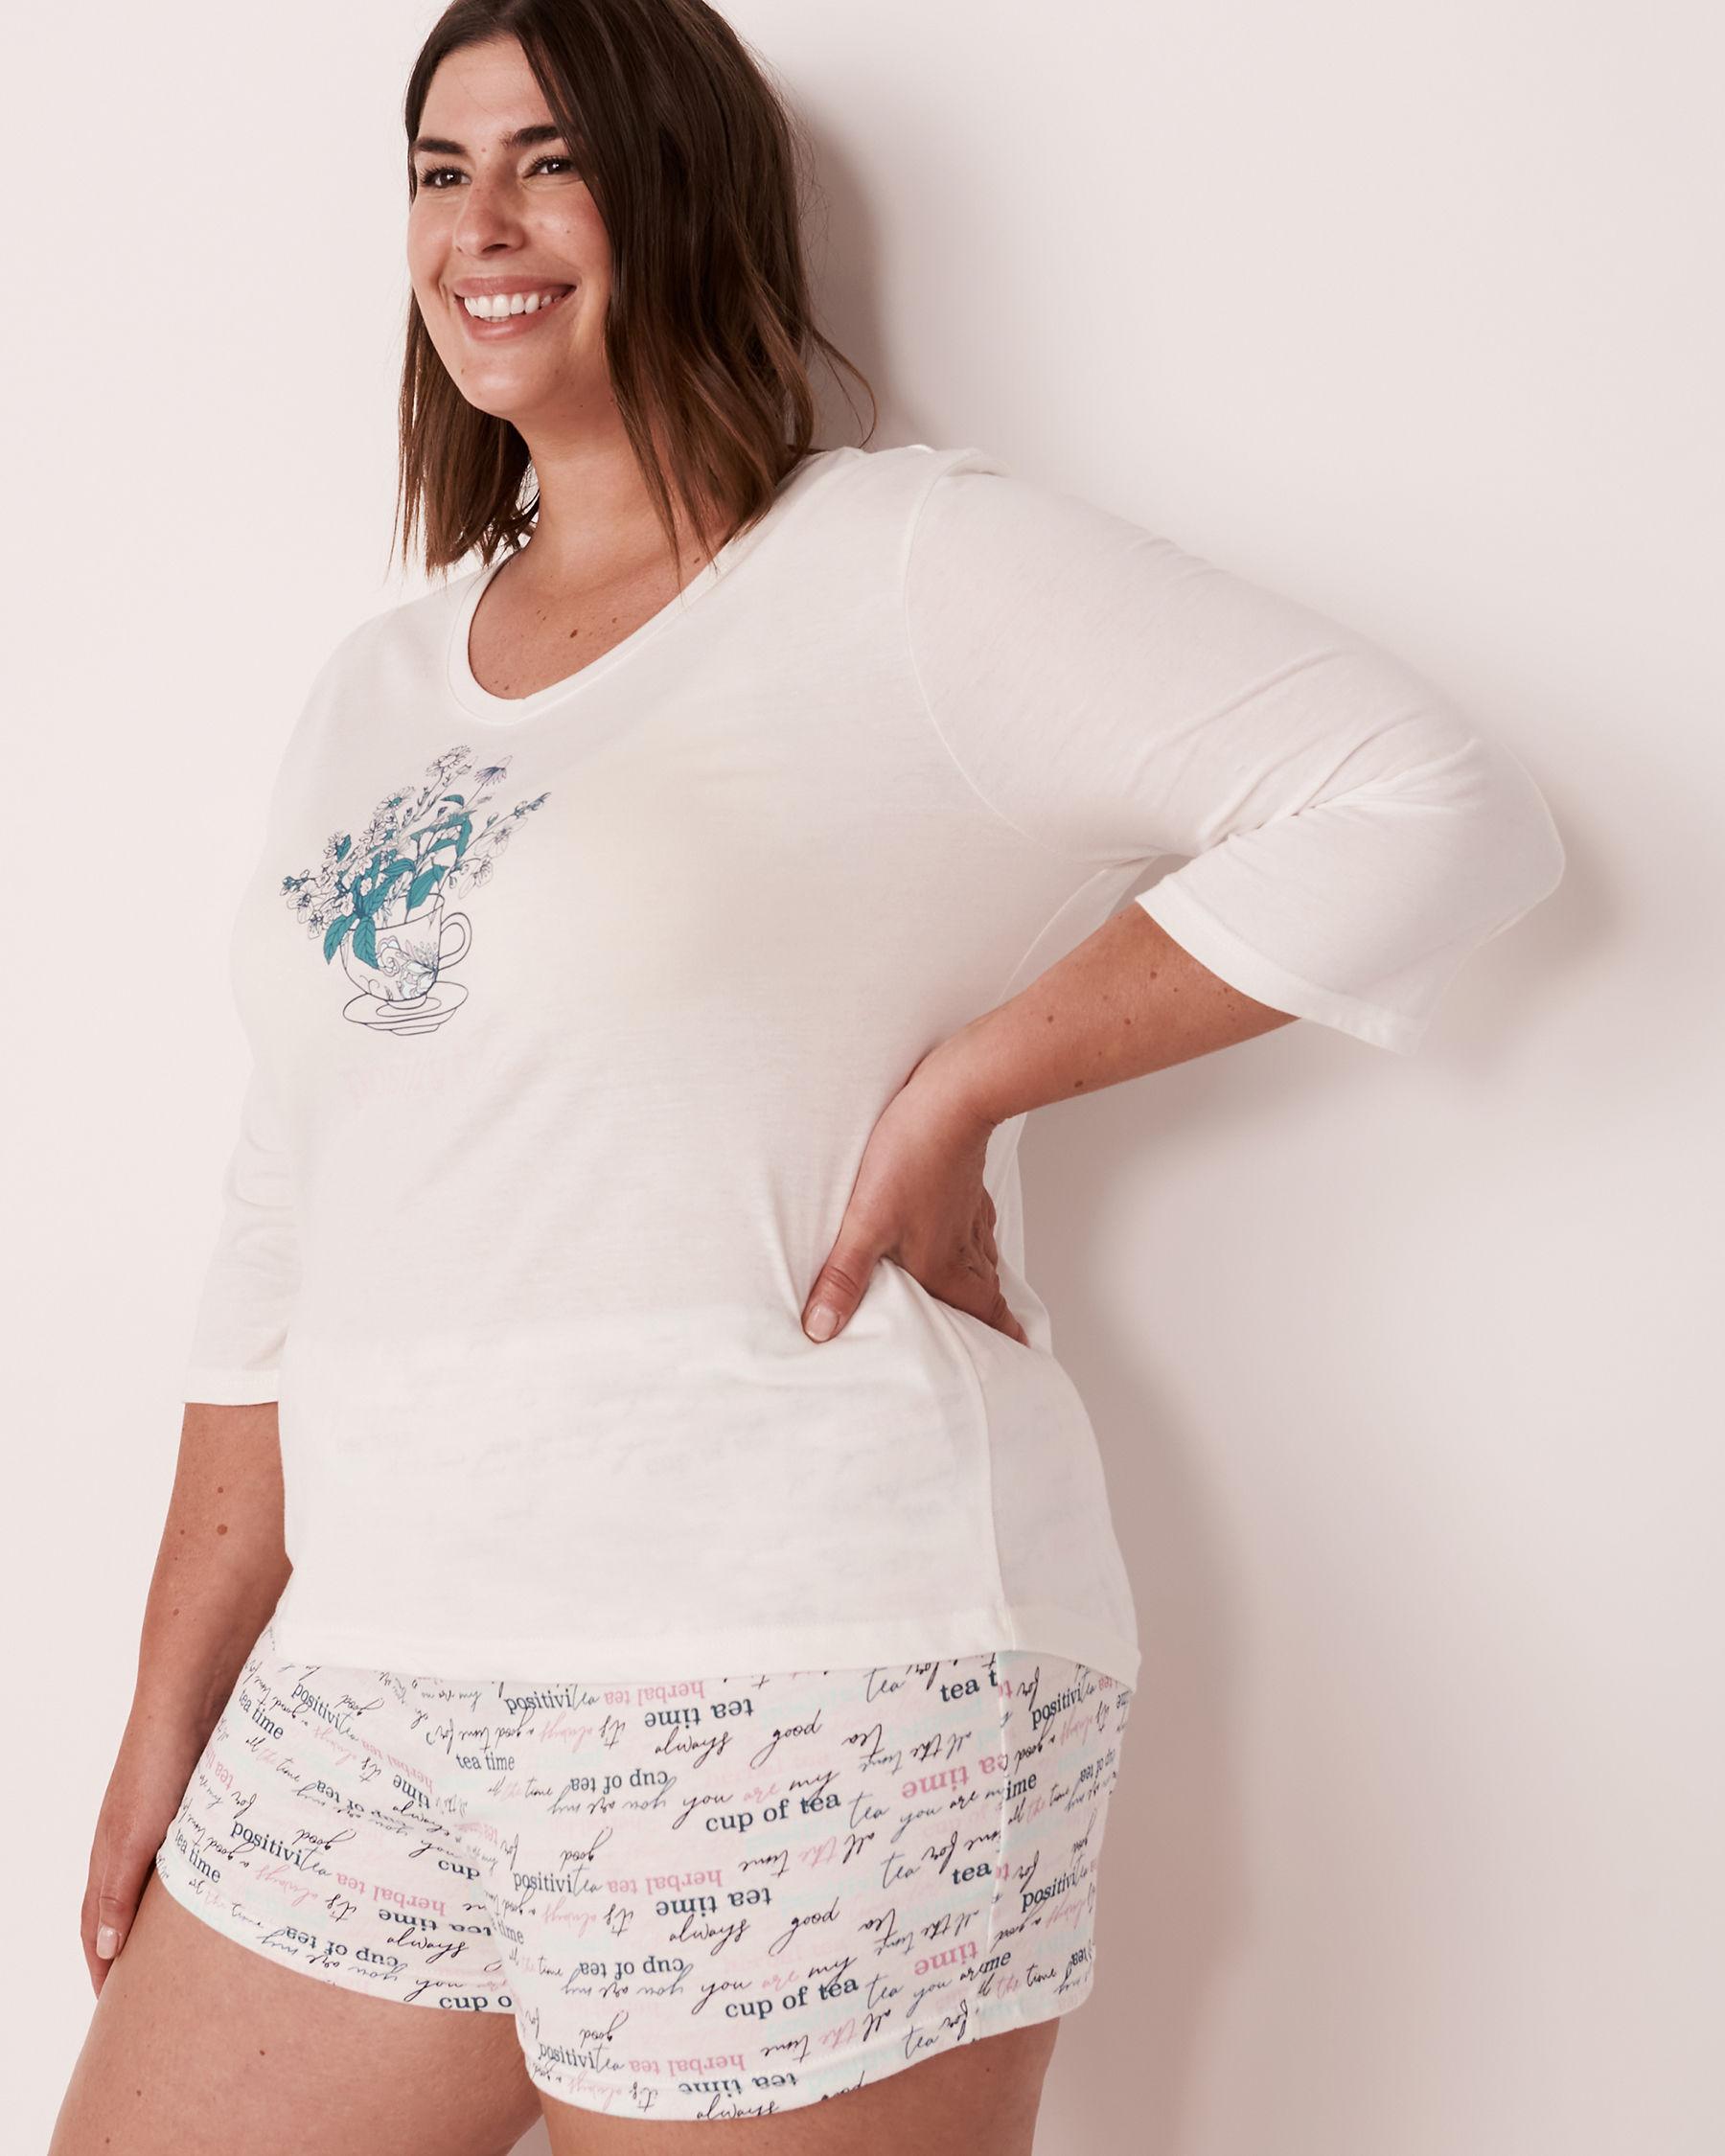 LA VIE EN ROSE V-neckline 3/4 Sleeve Shirt White 40100179 - View4